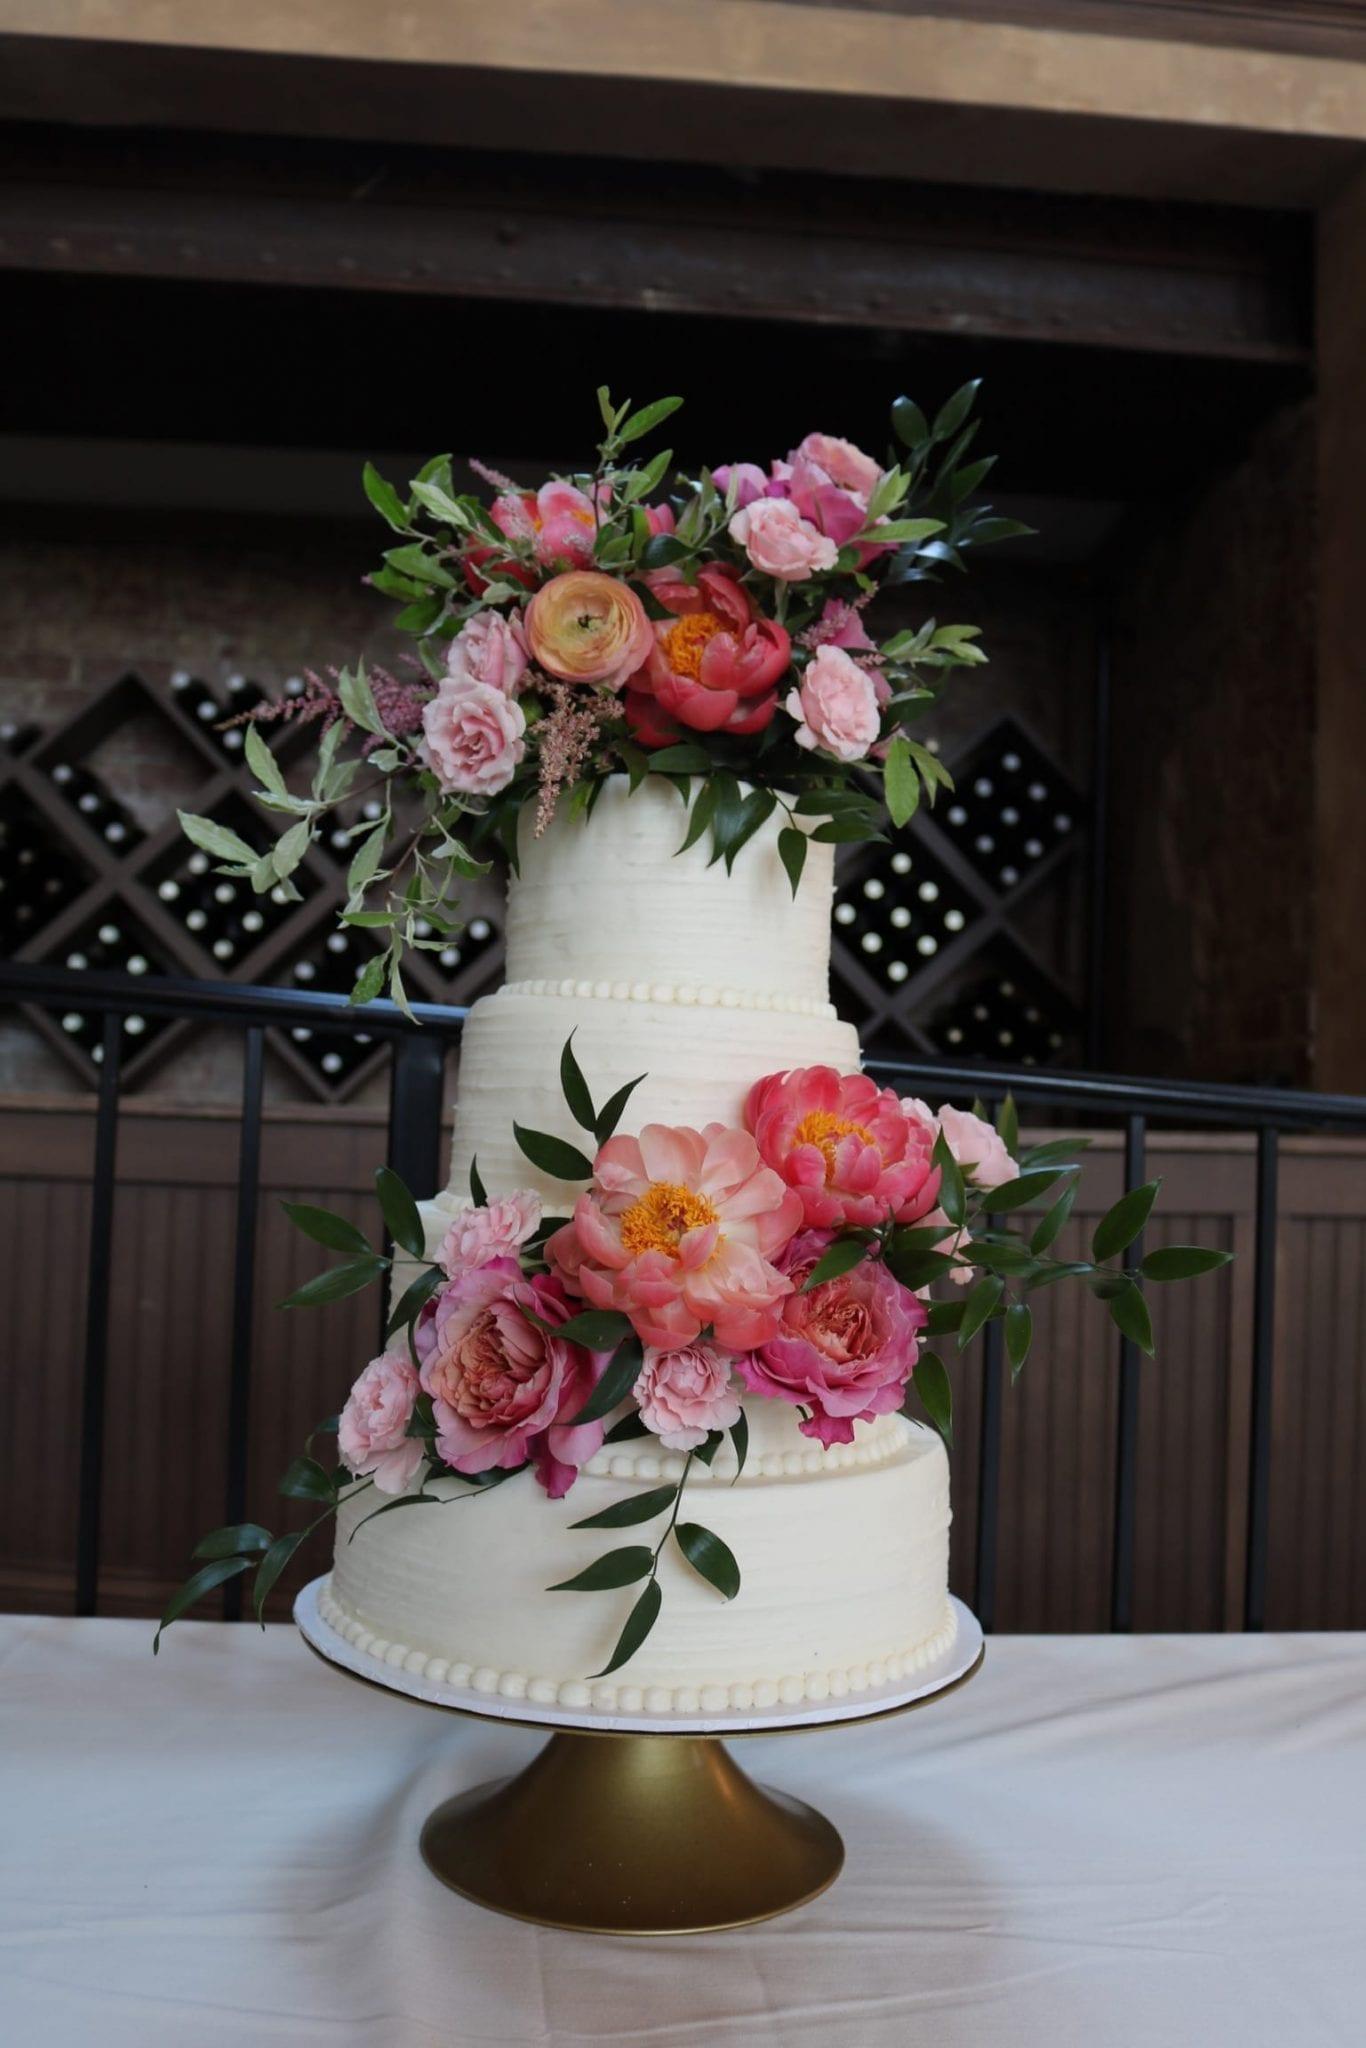 3 Tier Textured Buttercream Wedding Cake| 3 Sweet Girls Cakery